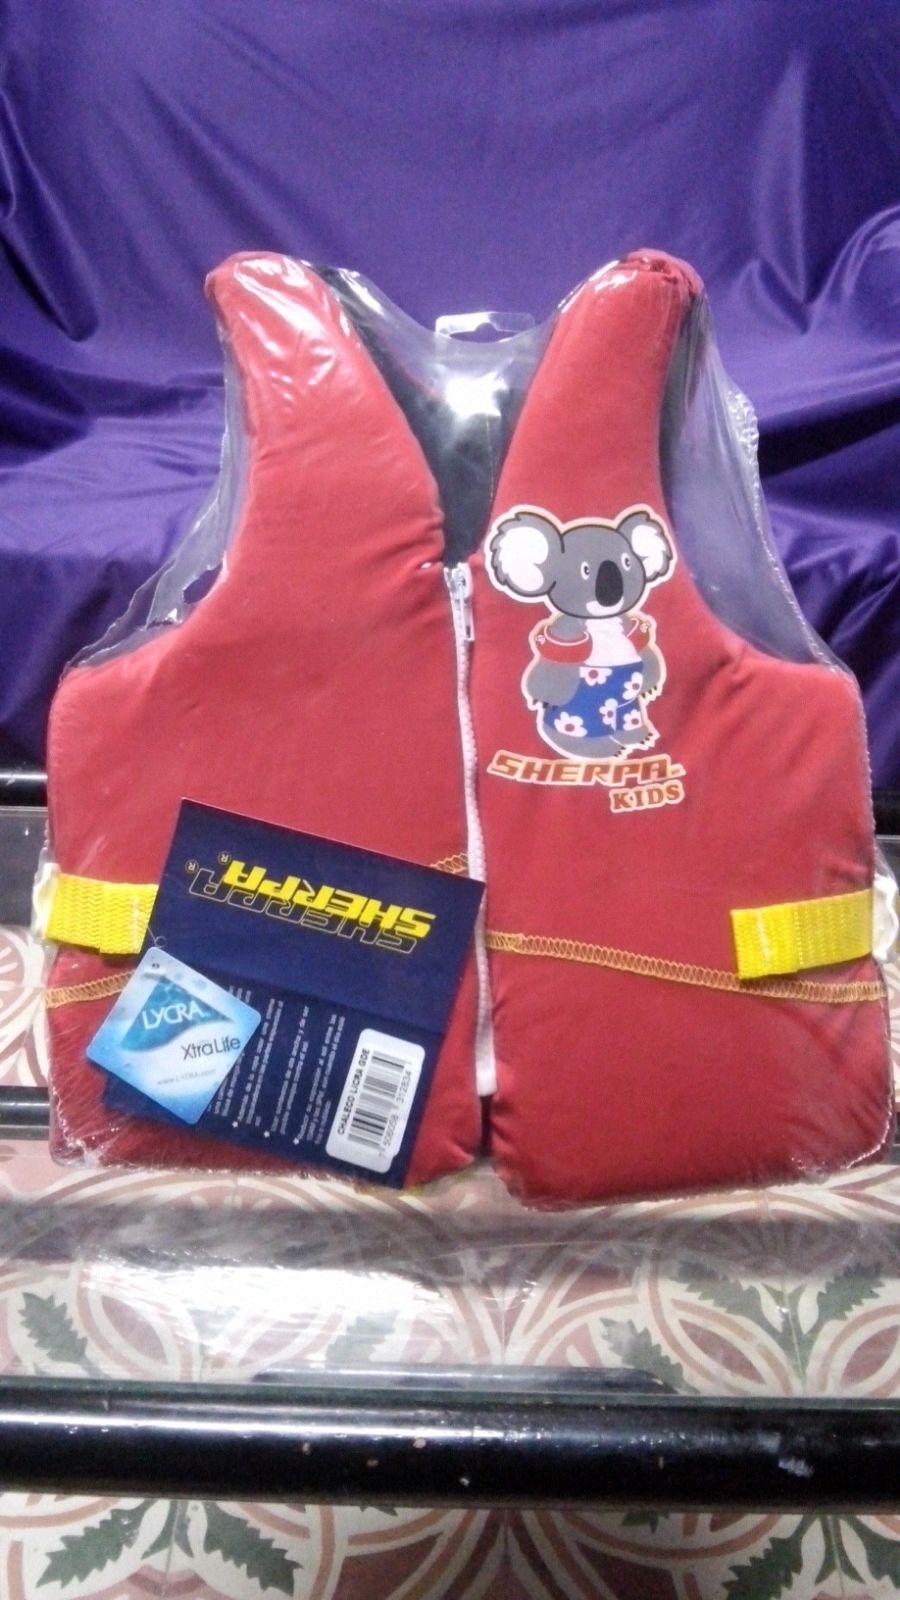 Walmart: Chaleco entrenador para nadar Sherpa $35.01